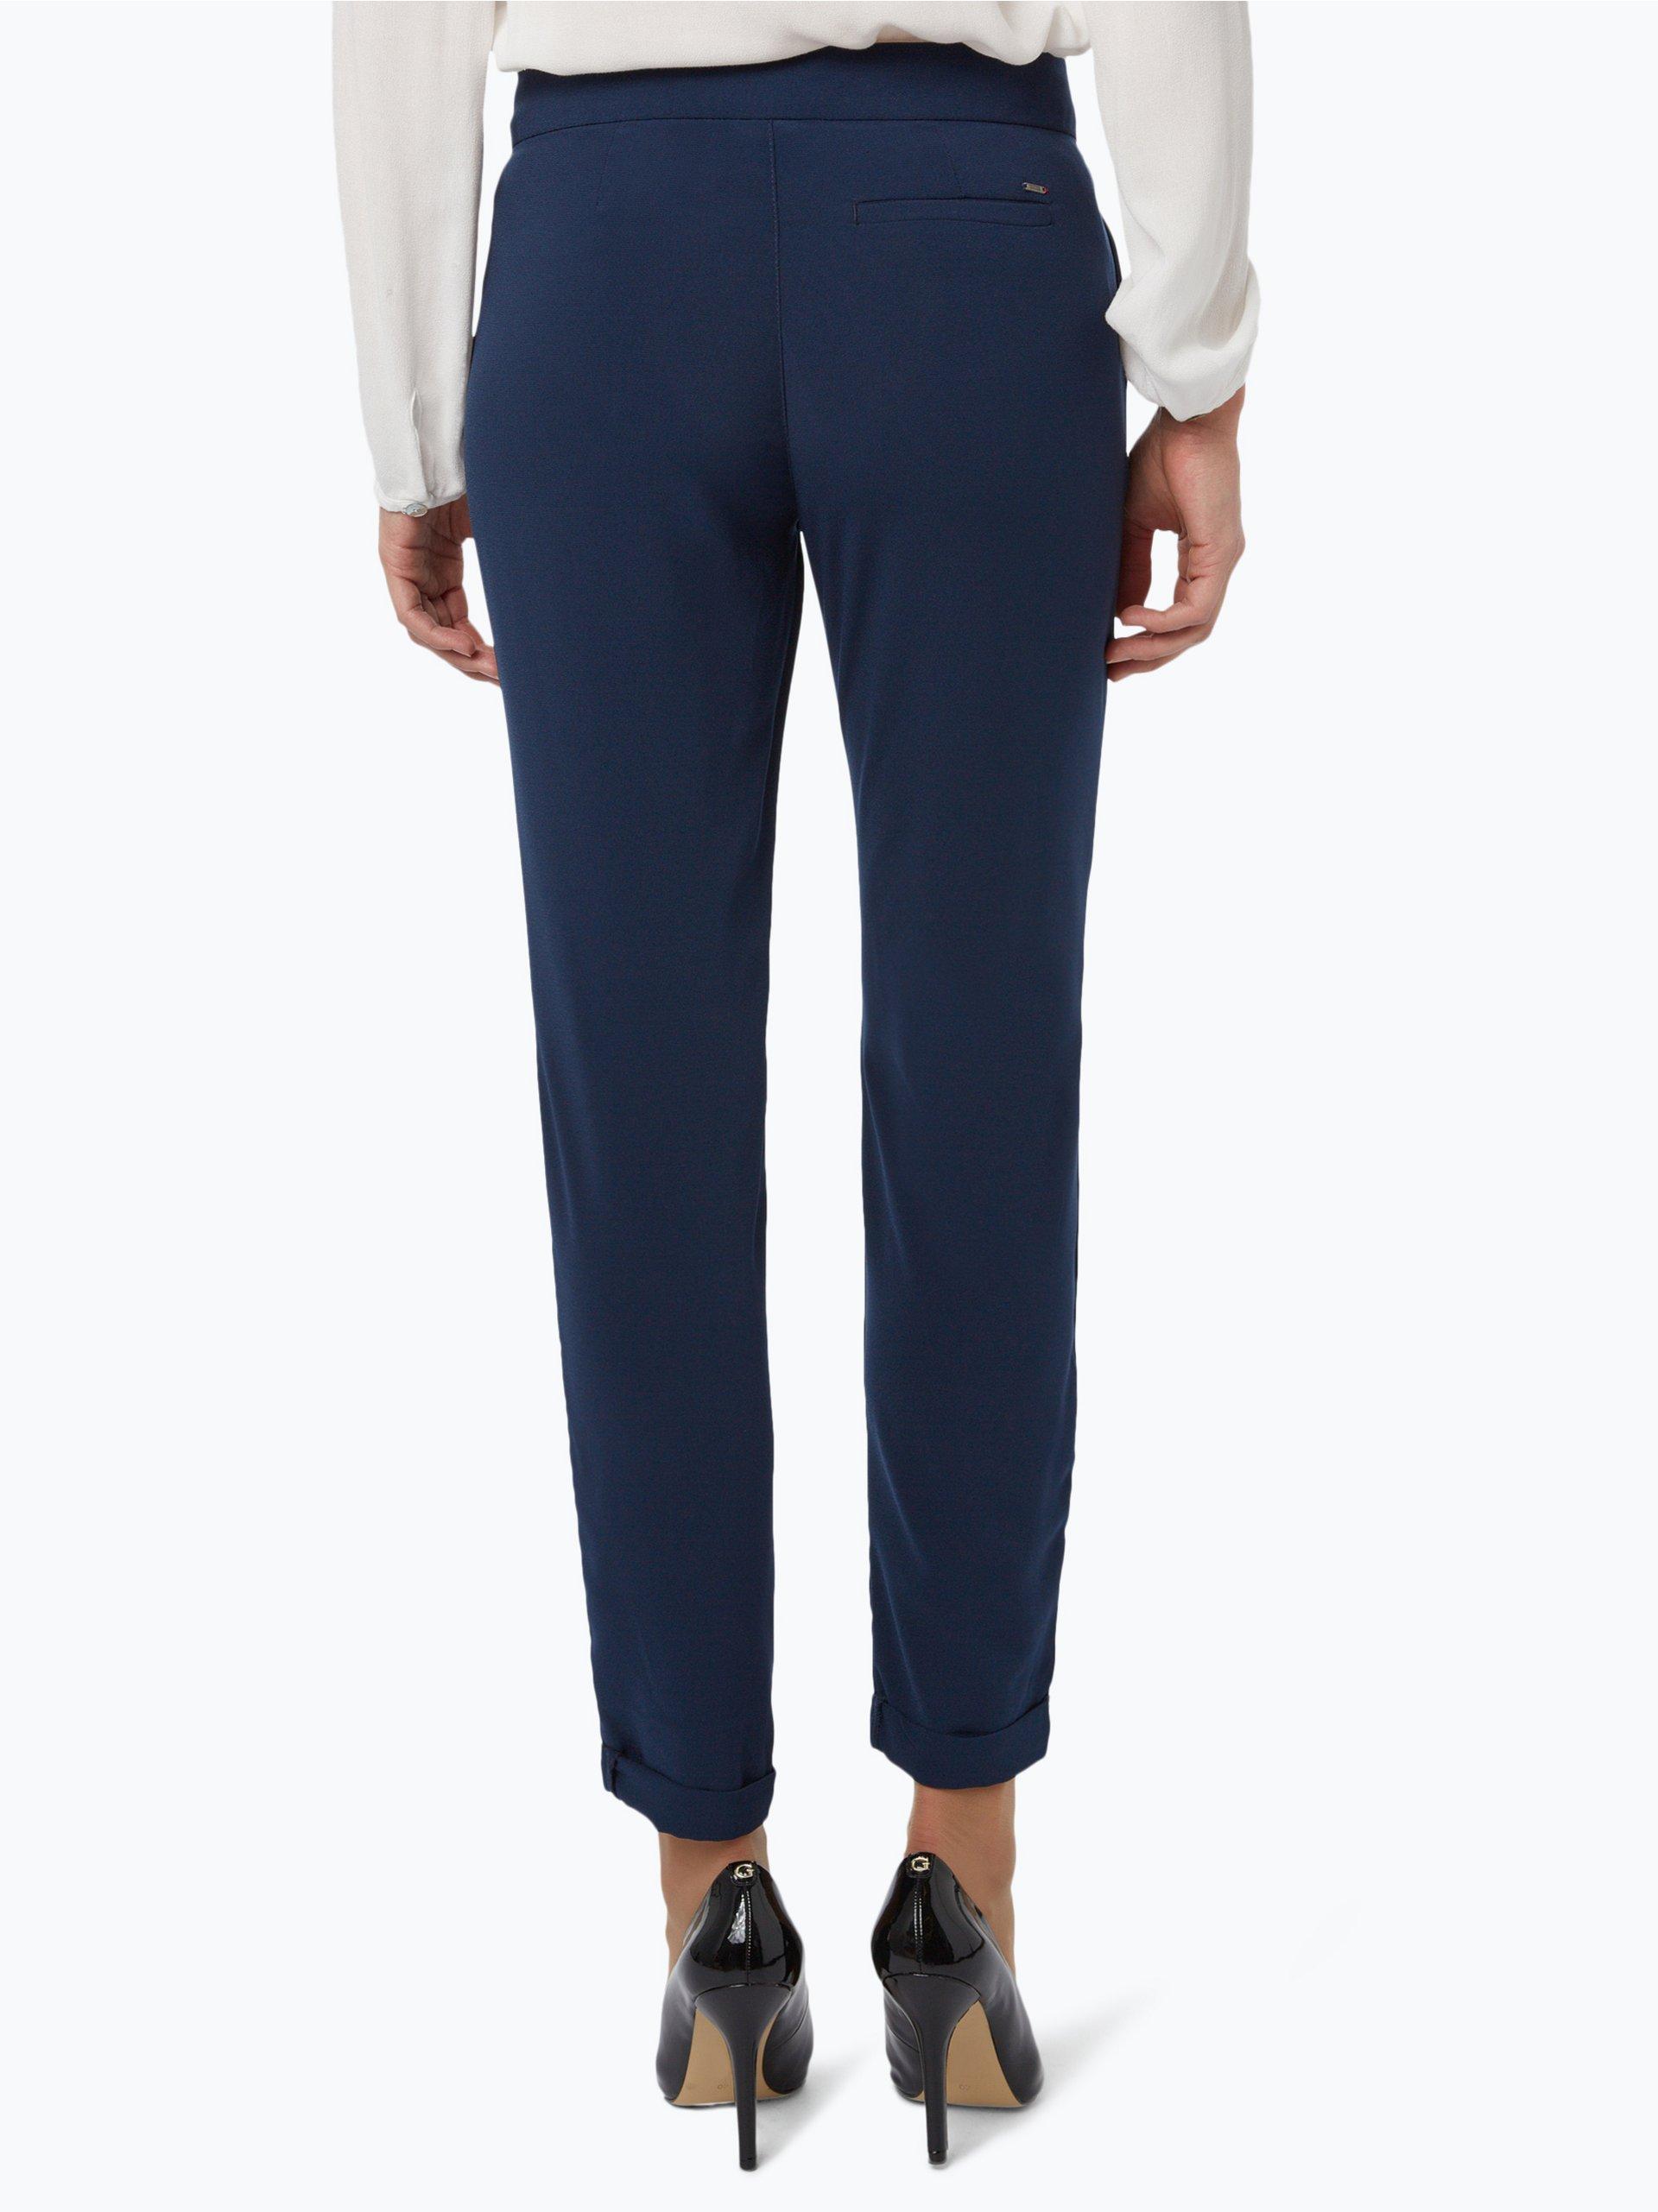 tommy jeans damen hose marine uni online kaufen peek und. Black Bedroom Furniture Sets. Home Design Ideas